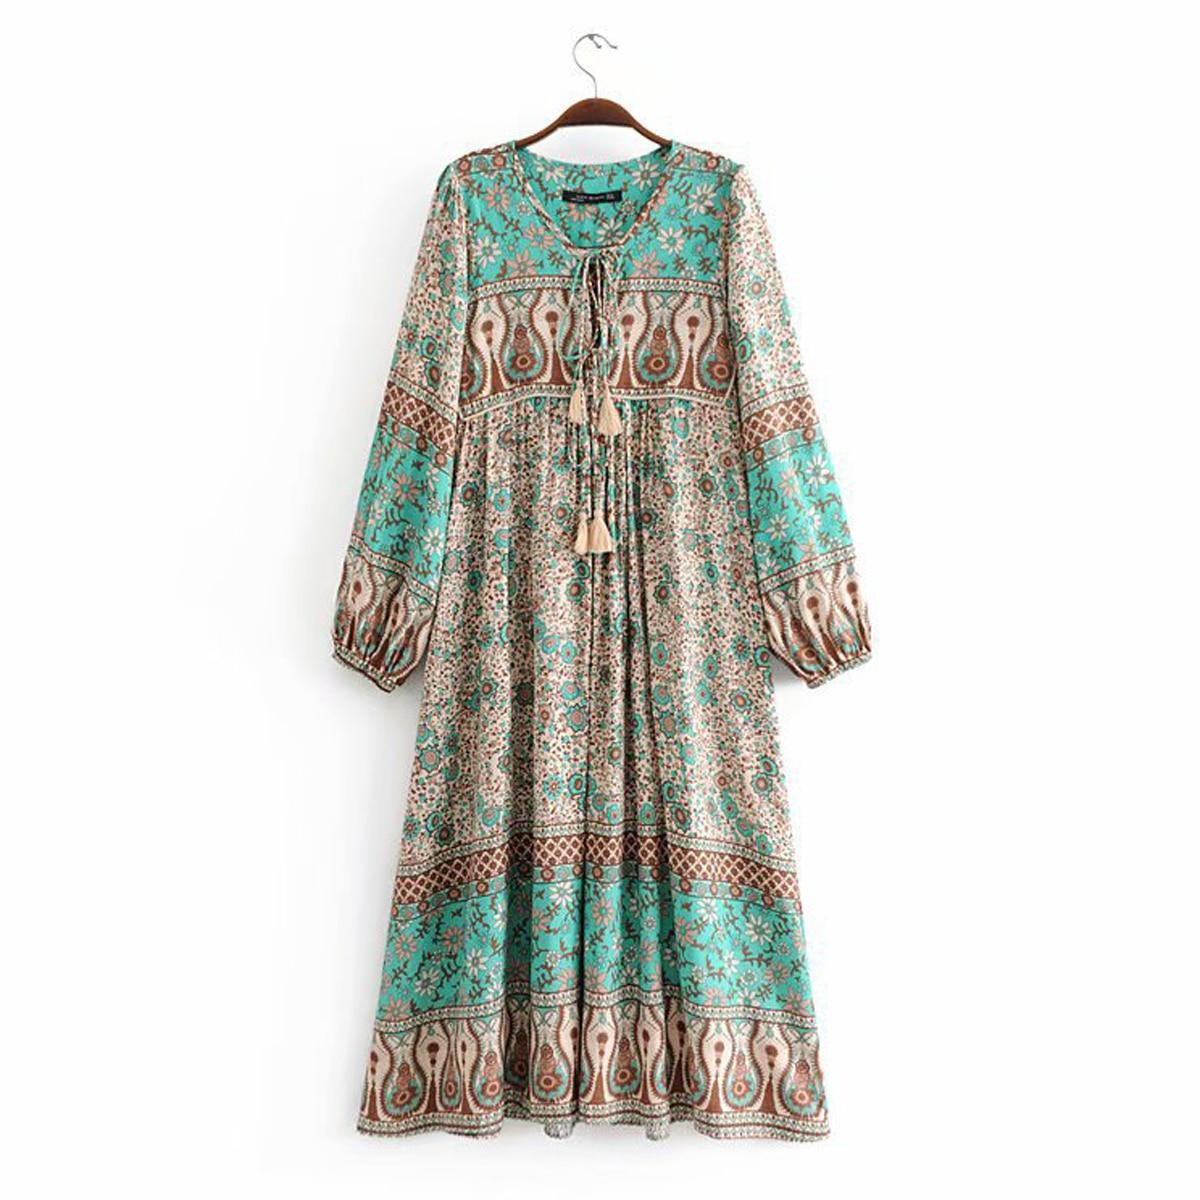 Gypsy Hippie Floral Print Dress 2018 Autumn Boho People Women Sexy Tassel V-Neck Long Sleeve  Bohemia Midi Dress